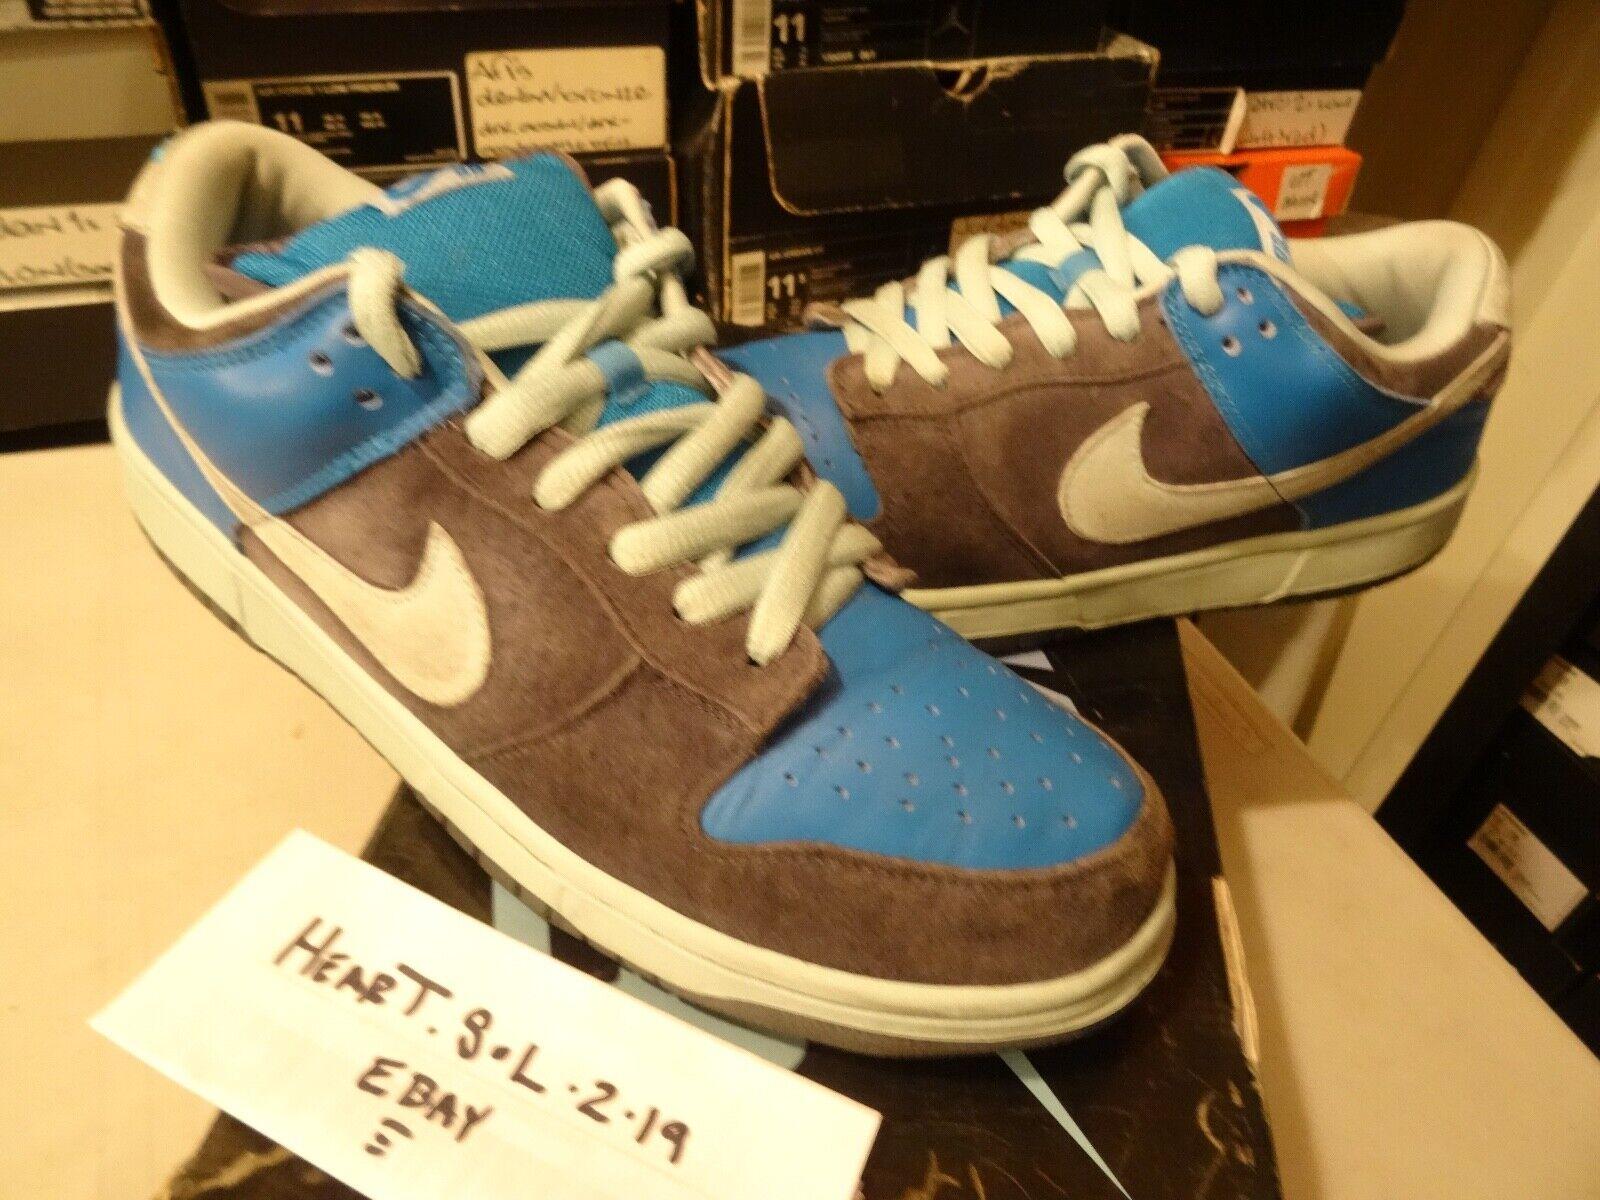 Nike Dunk Low Pro SB 'Aqua Chalk' Ash Aqua-Chalk 304292 032 SZ 13 OG RARE